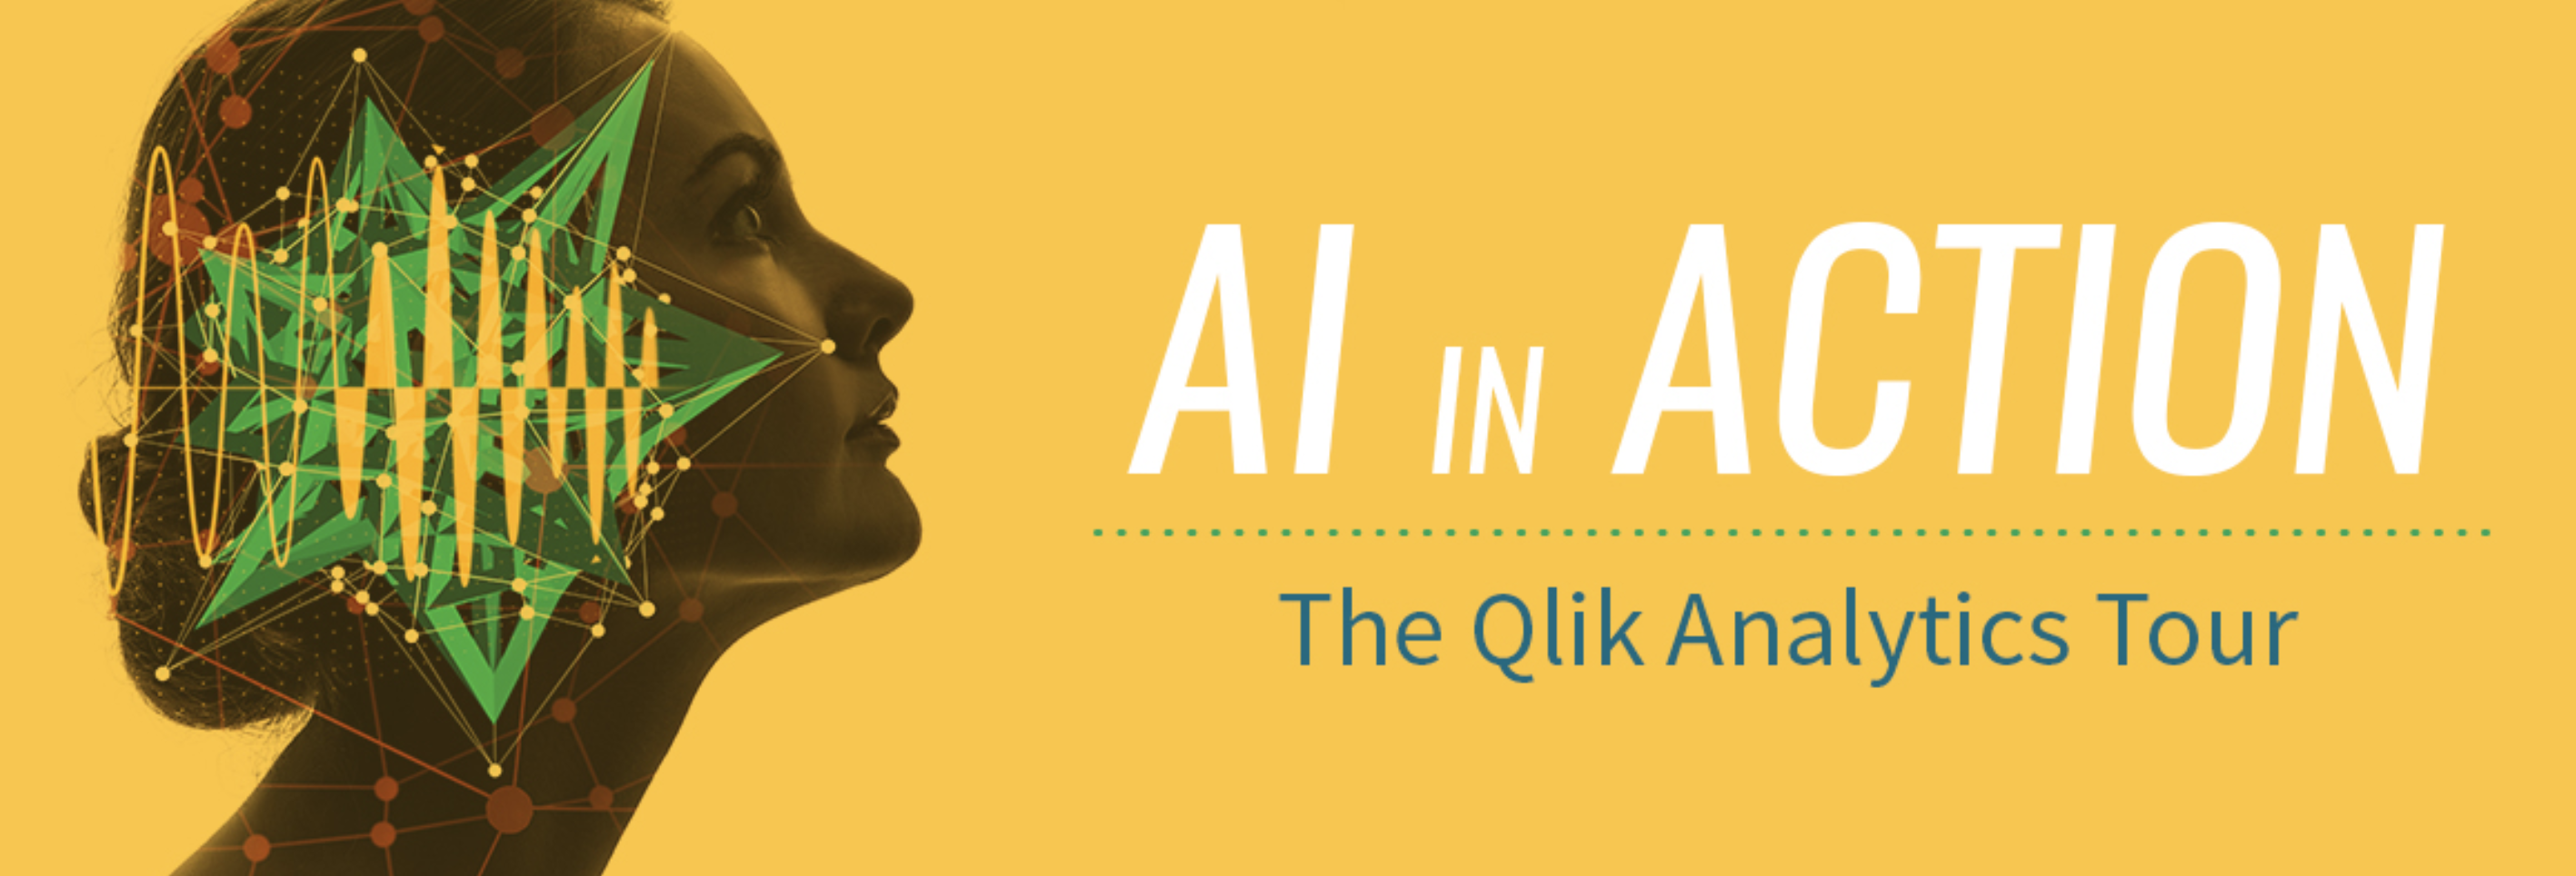 KEYRUS   The Qlik Analytics Tour stops in Montreal!